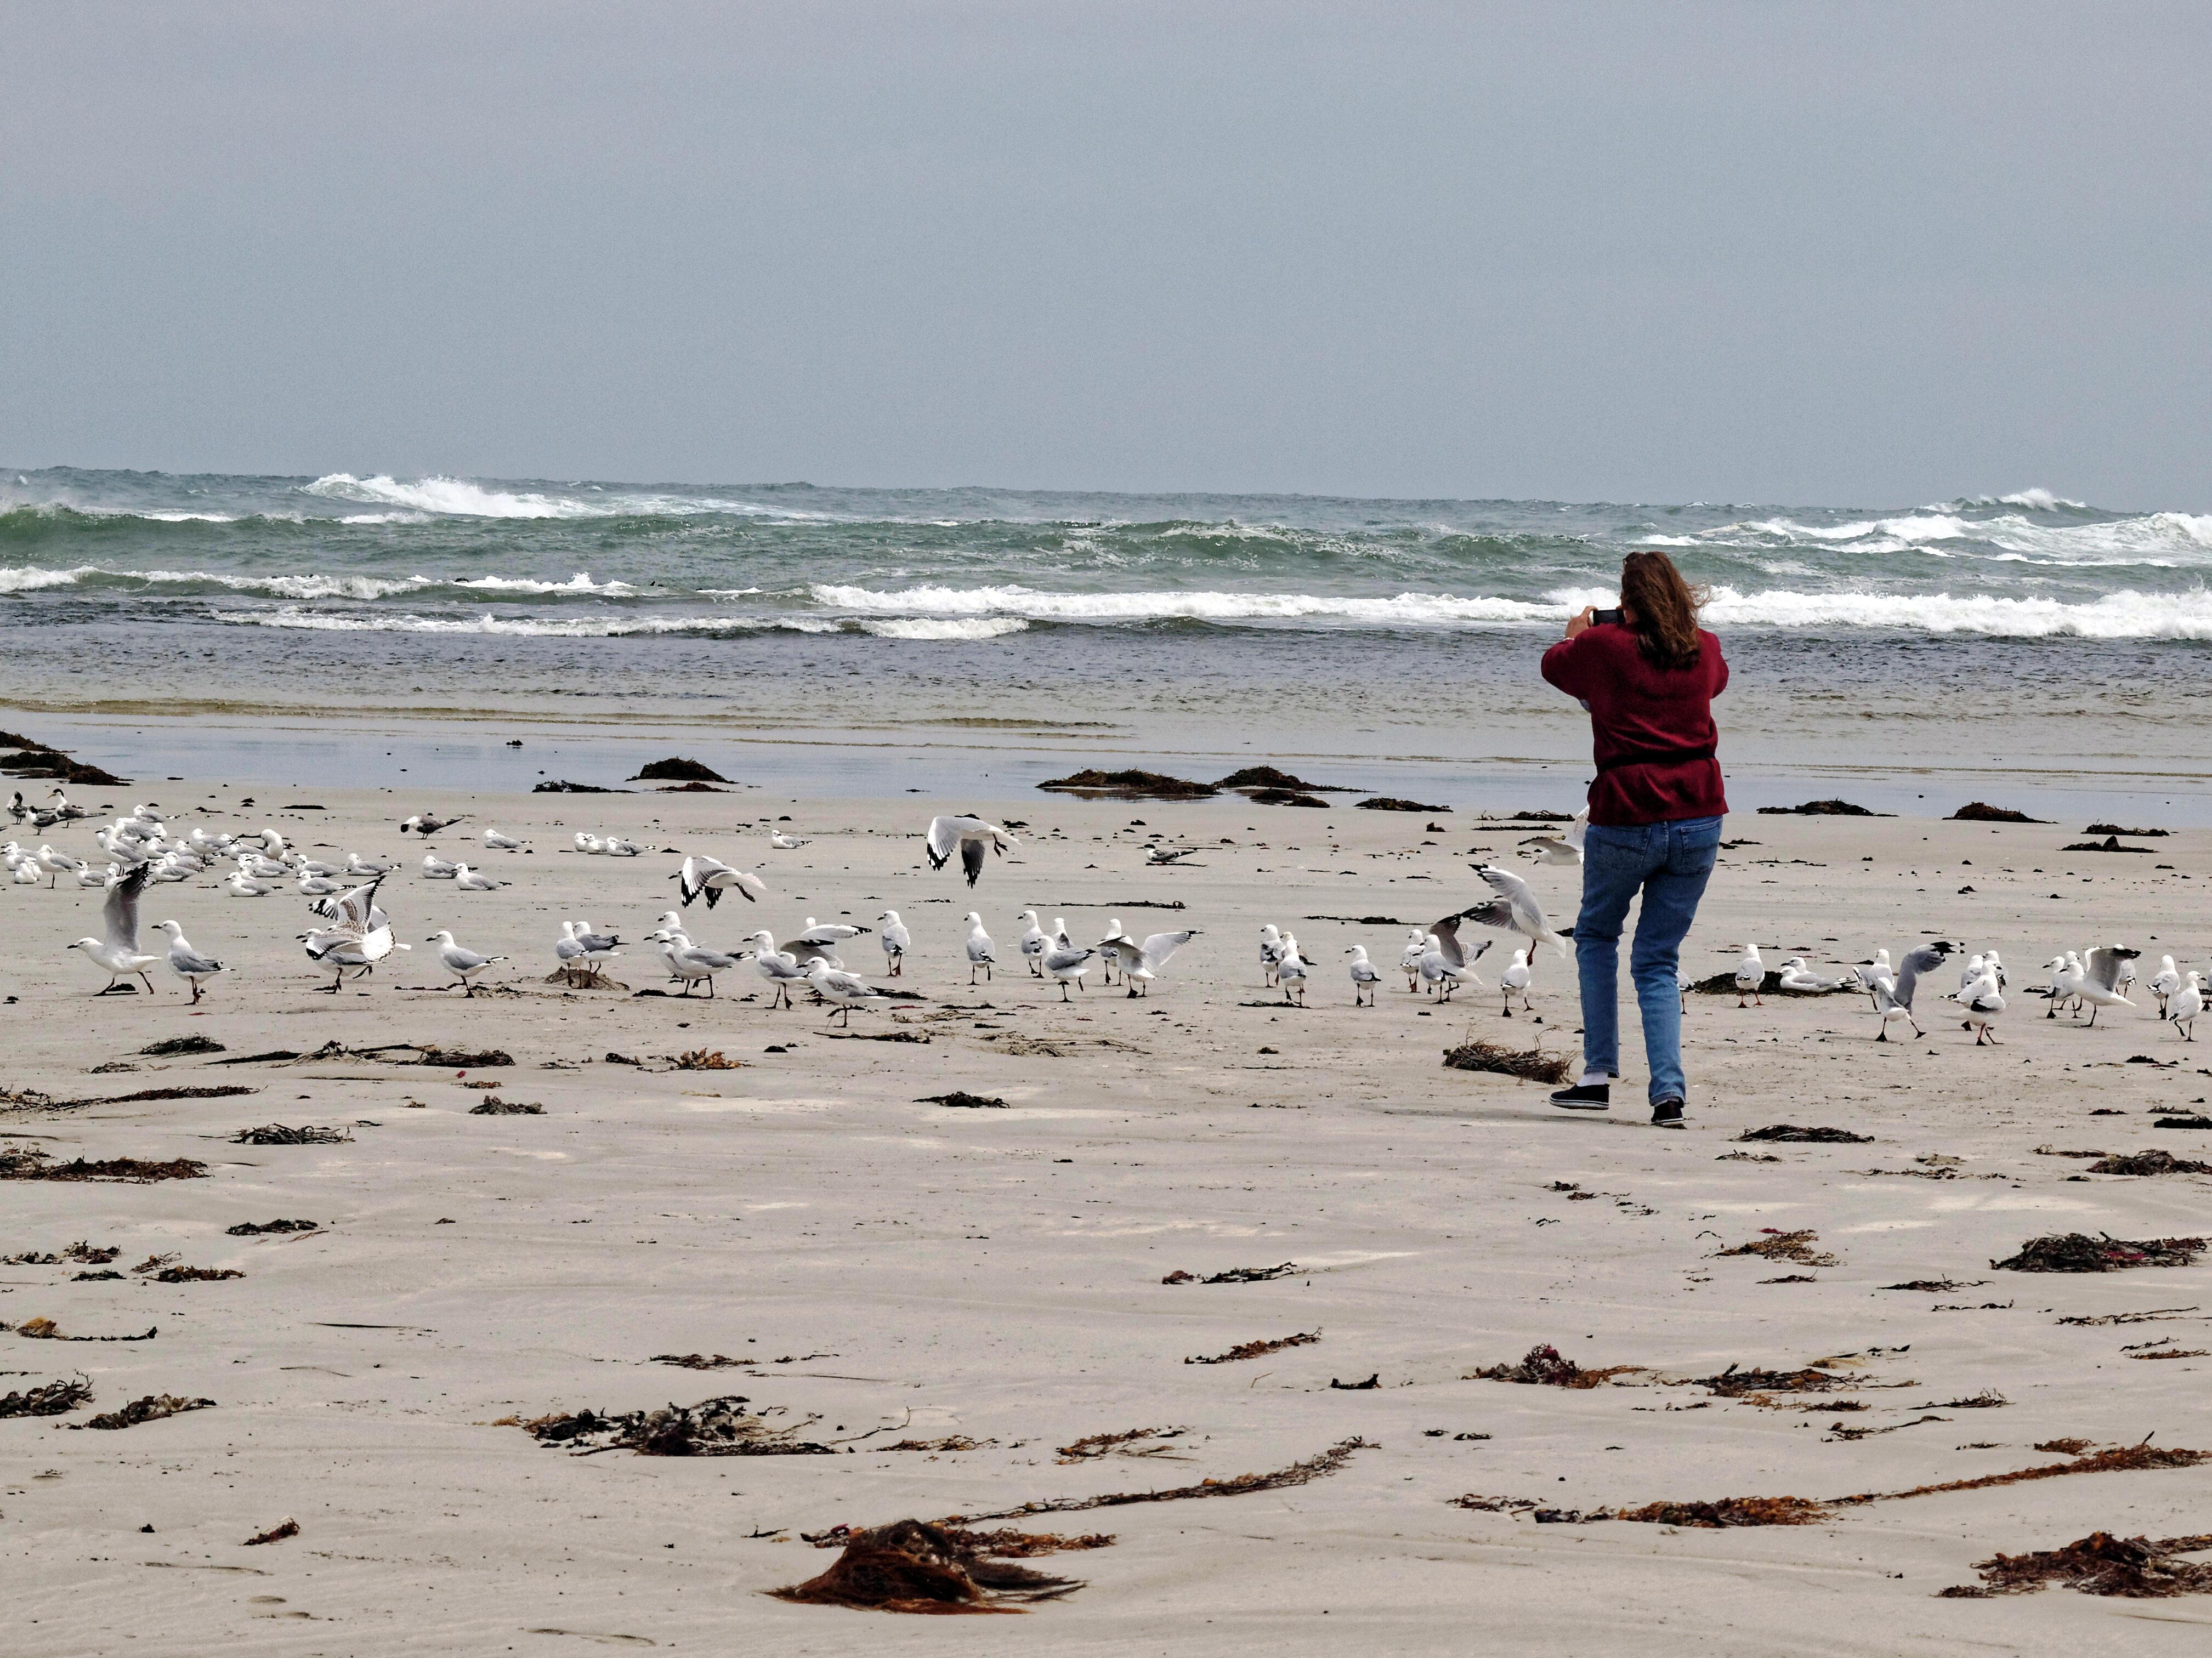 Yvonne-Seagulls-7.jpeg